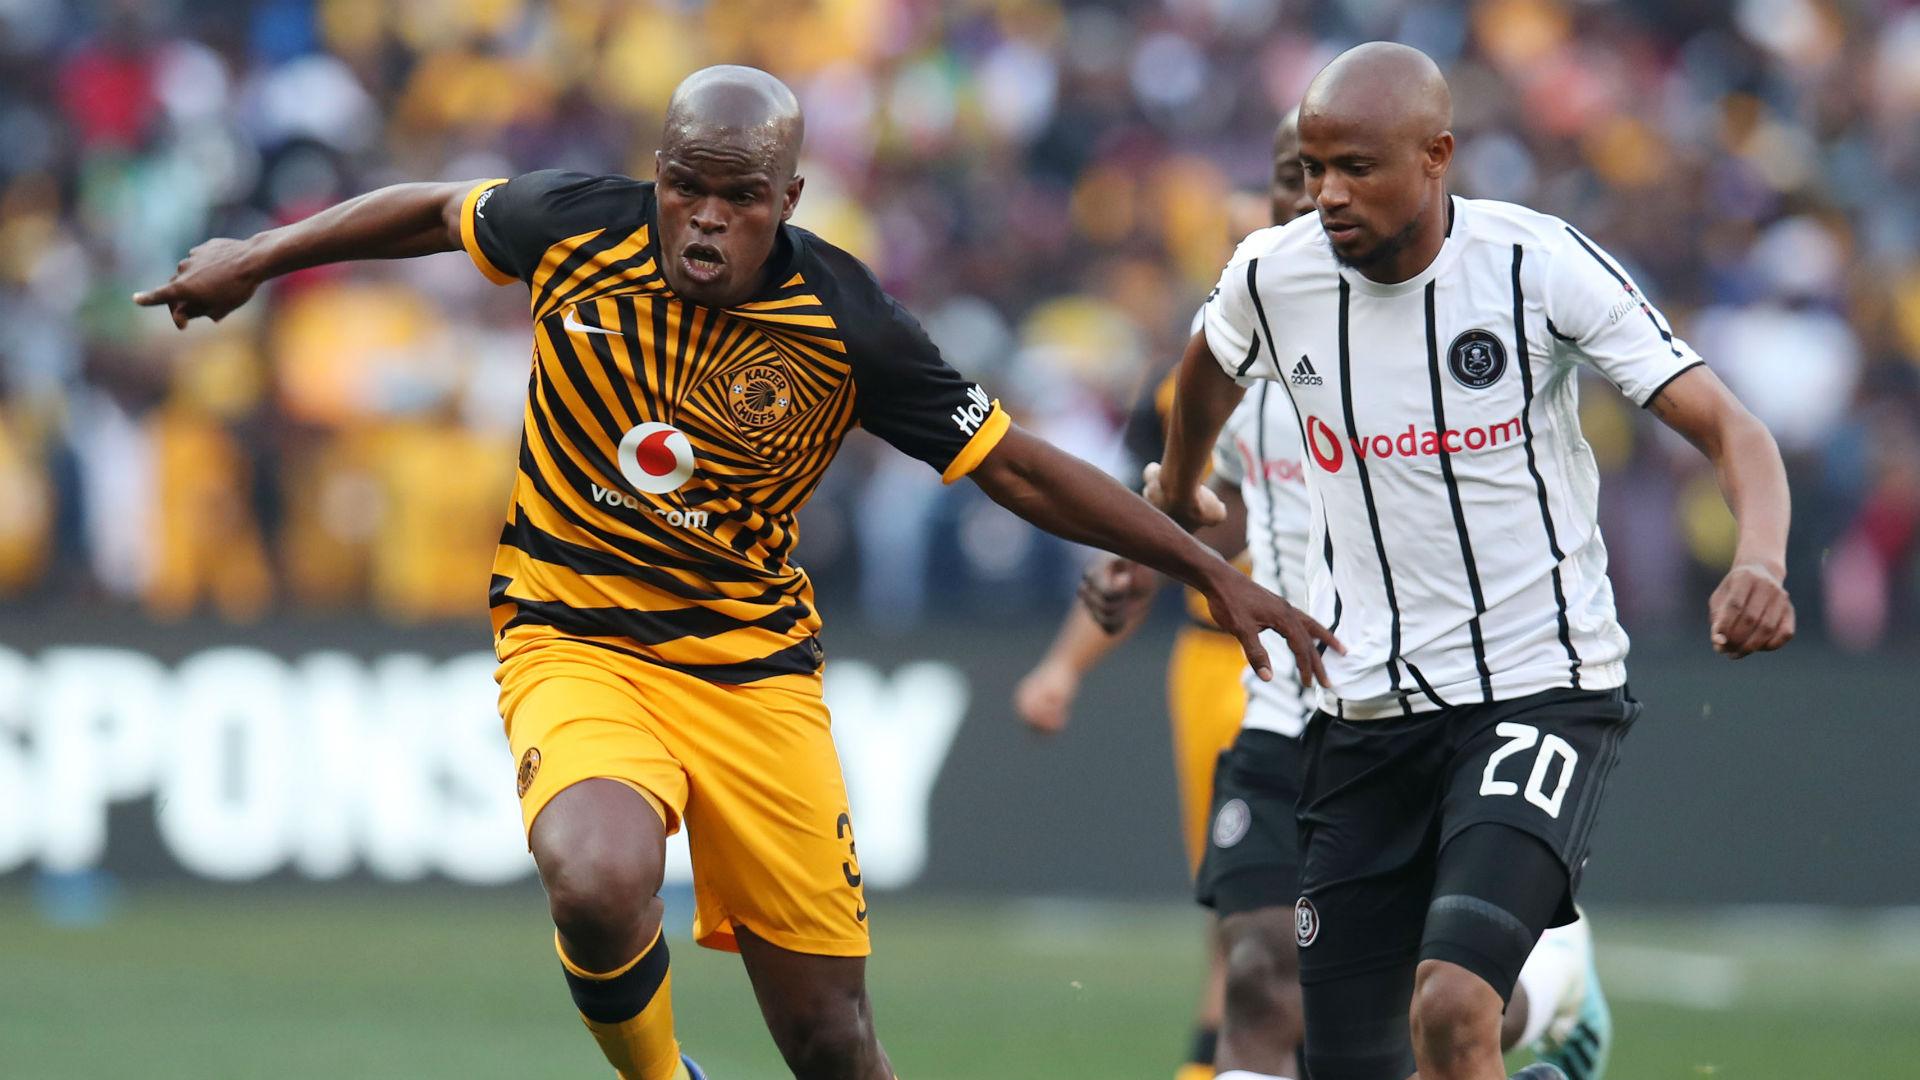 Katsande: Veteran midfielder signs new Kaizer Chiefs deal